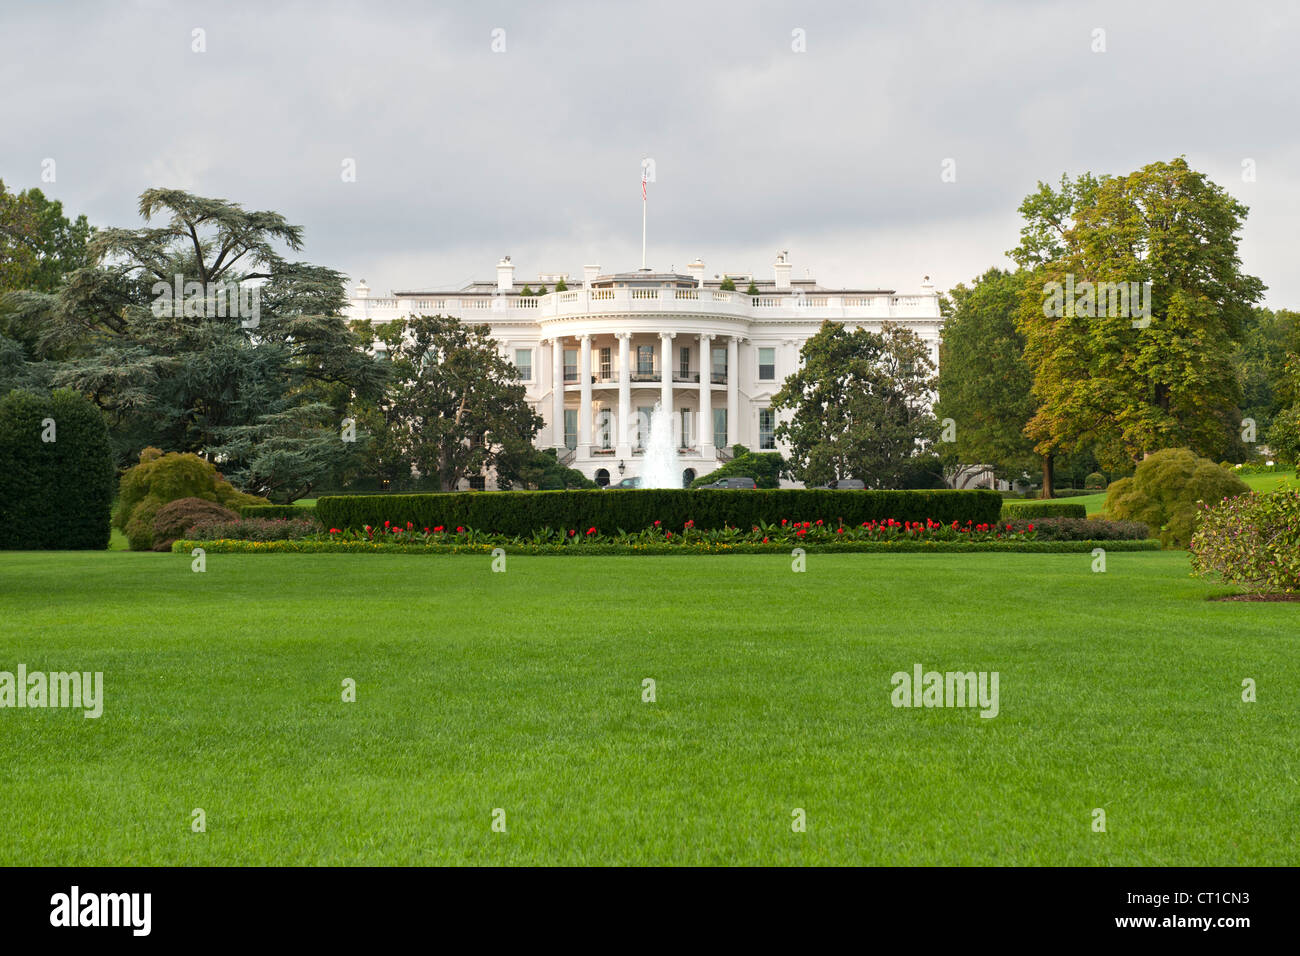 The White House, Washington DC, USA. - Stock Image